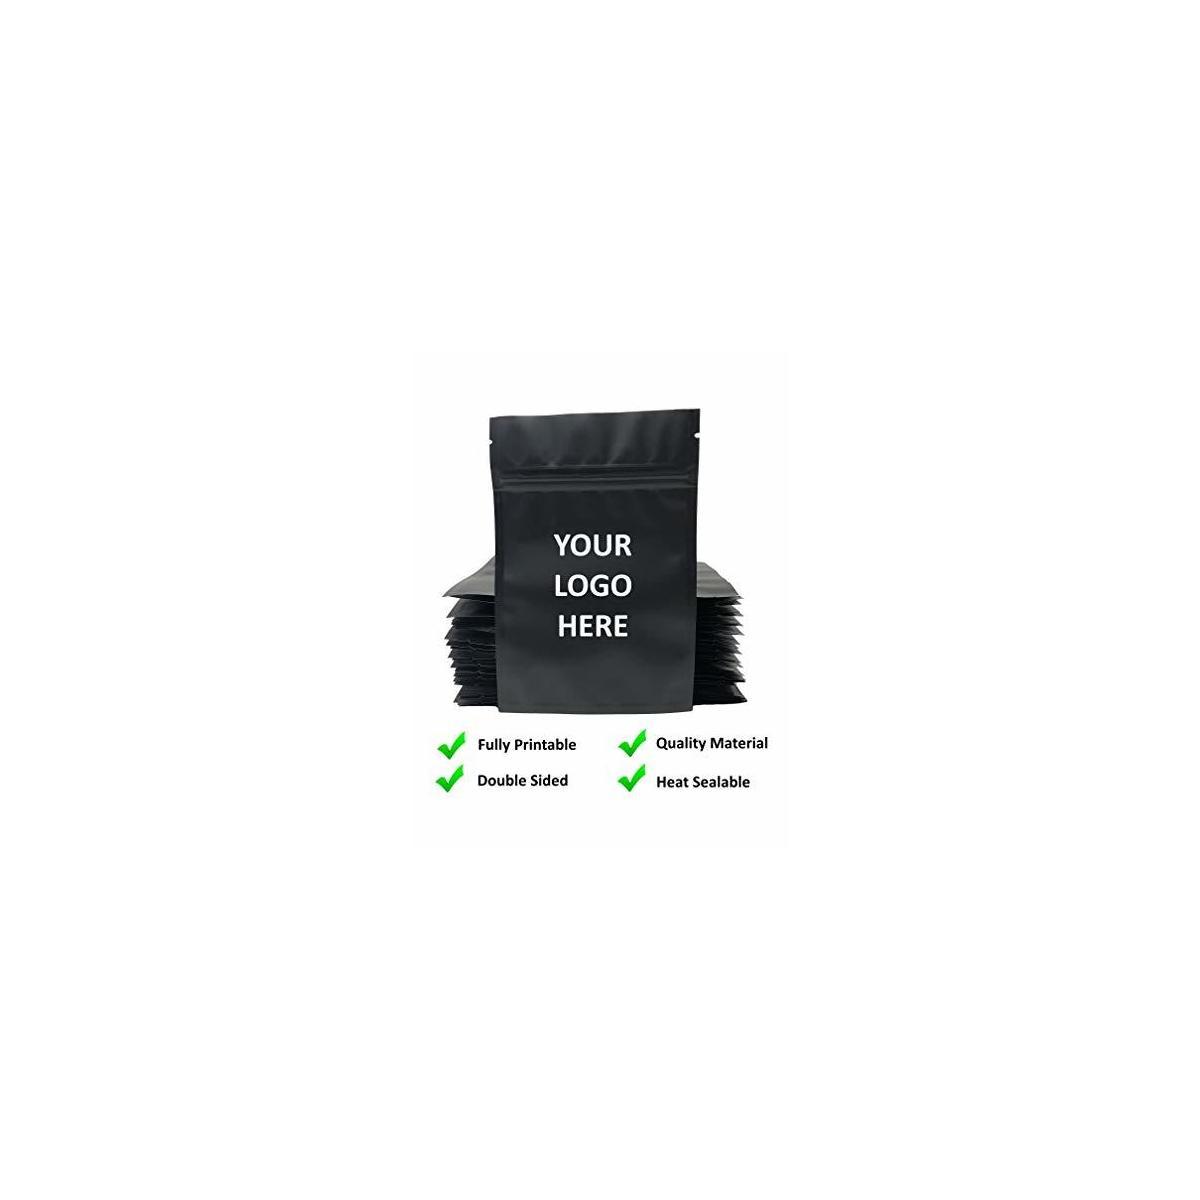 Smell Proof Flat Ziplock Double-Sided Reusable Metallic Food Storage Bags 4x6